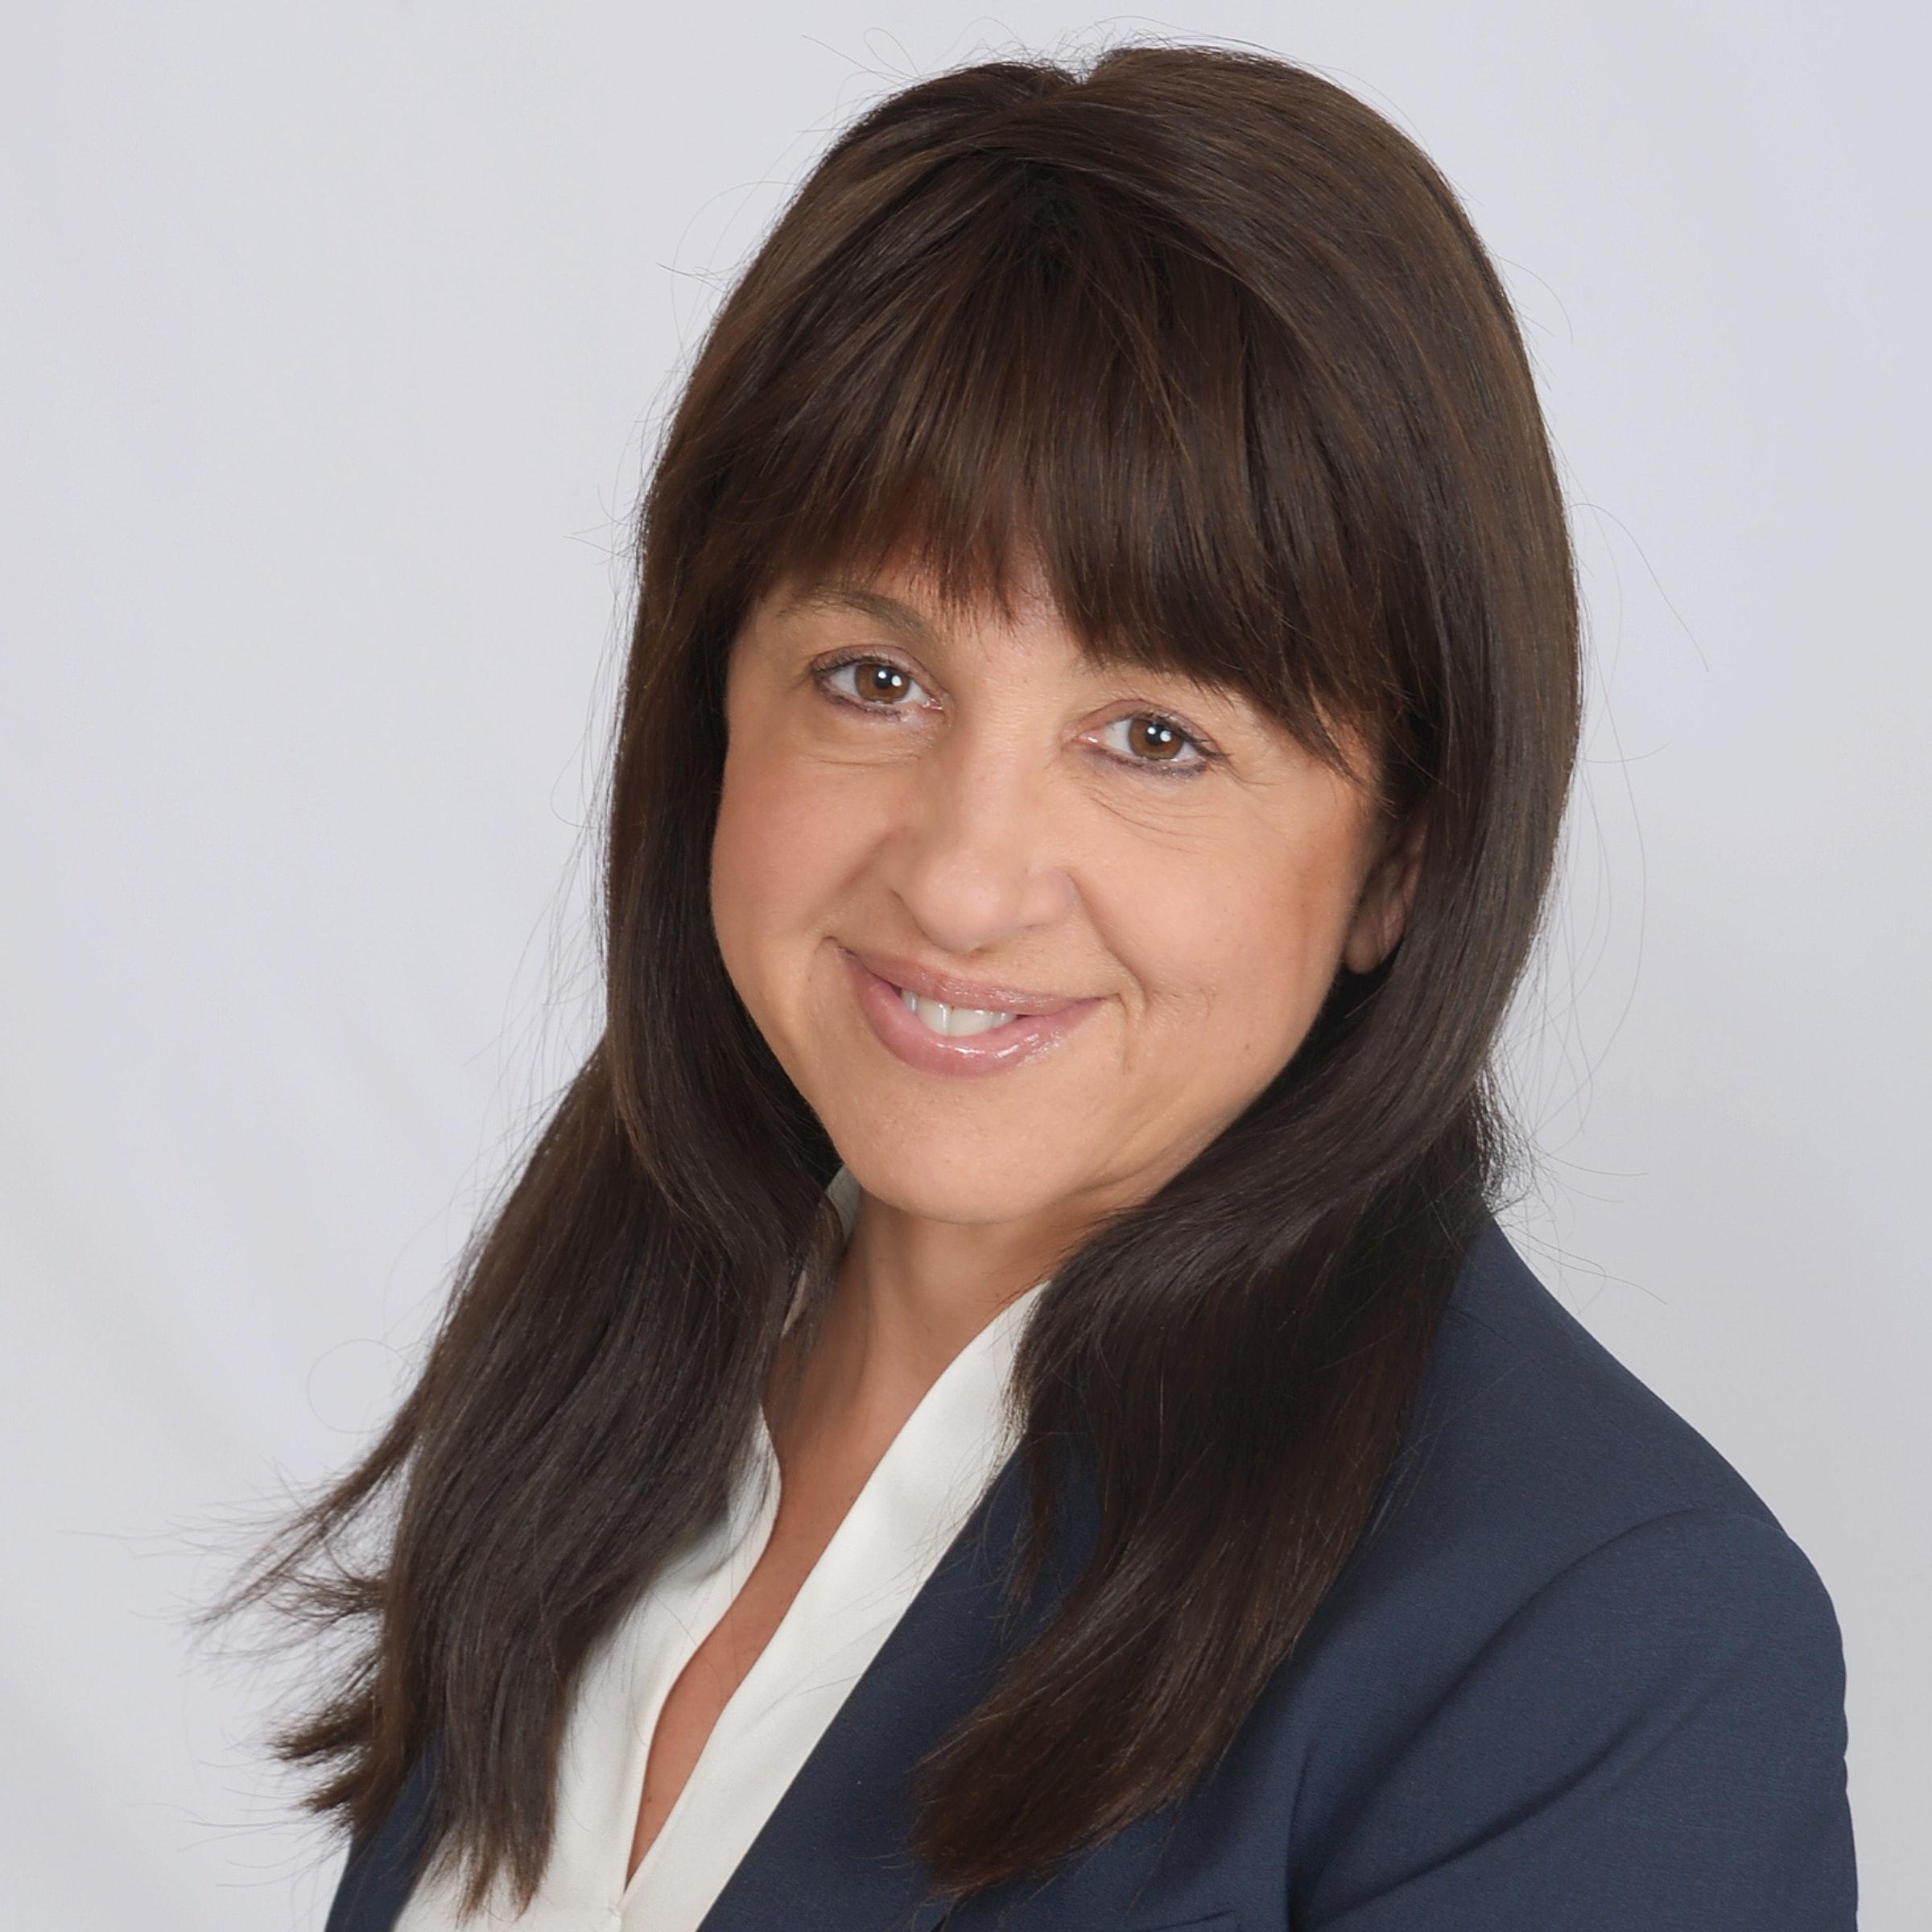 Denise Pirrotti Hummel 100 Coaches